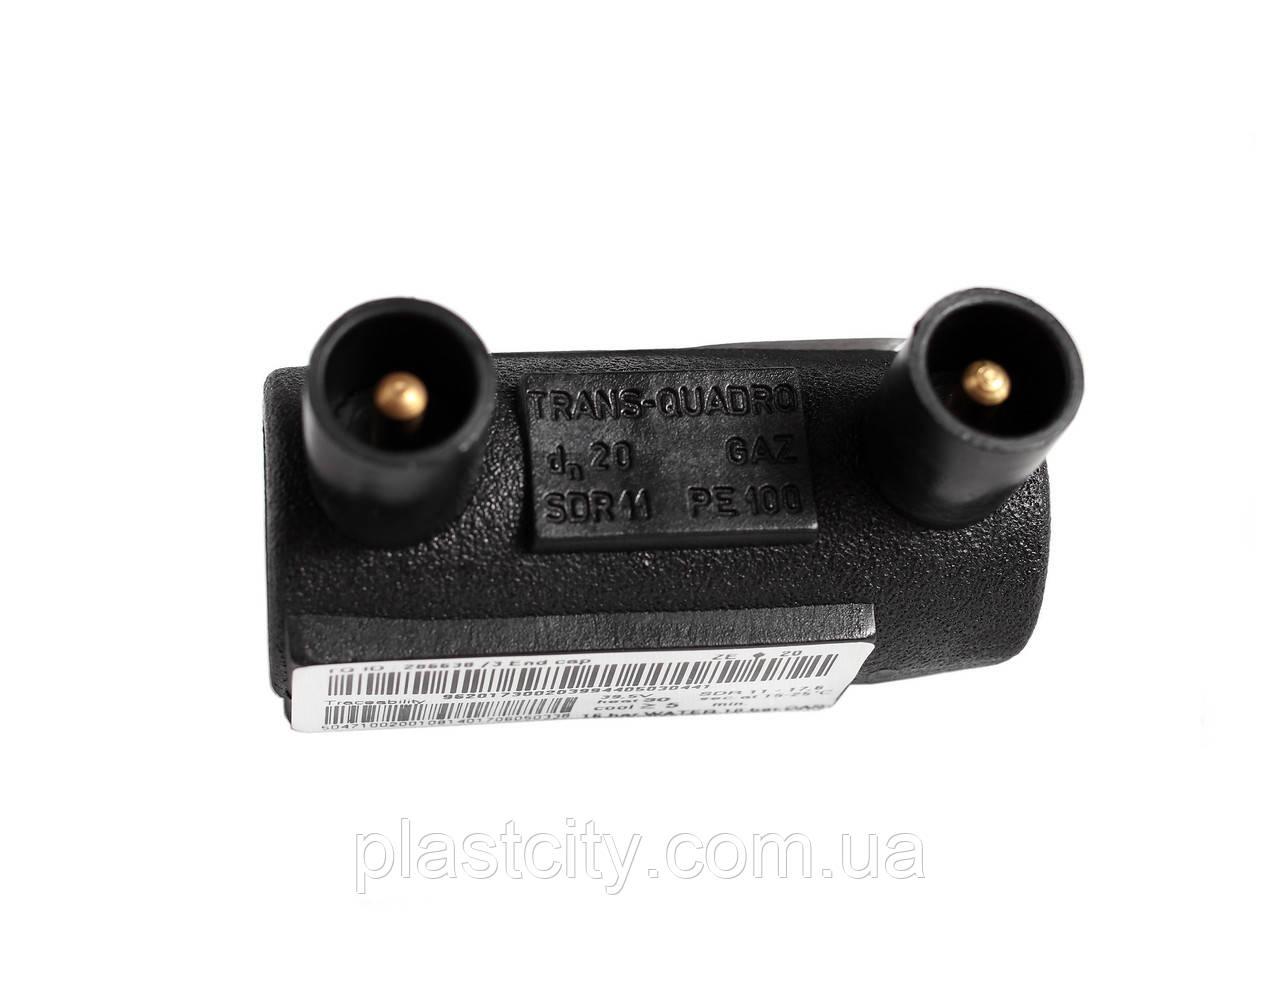 Муфта терморезисторная 50 мм ПЭ100 SDR11